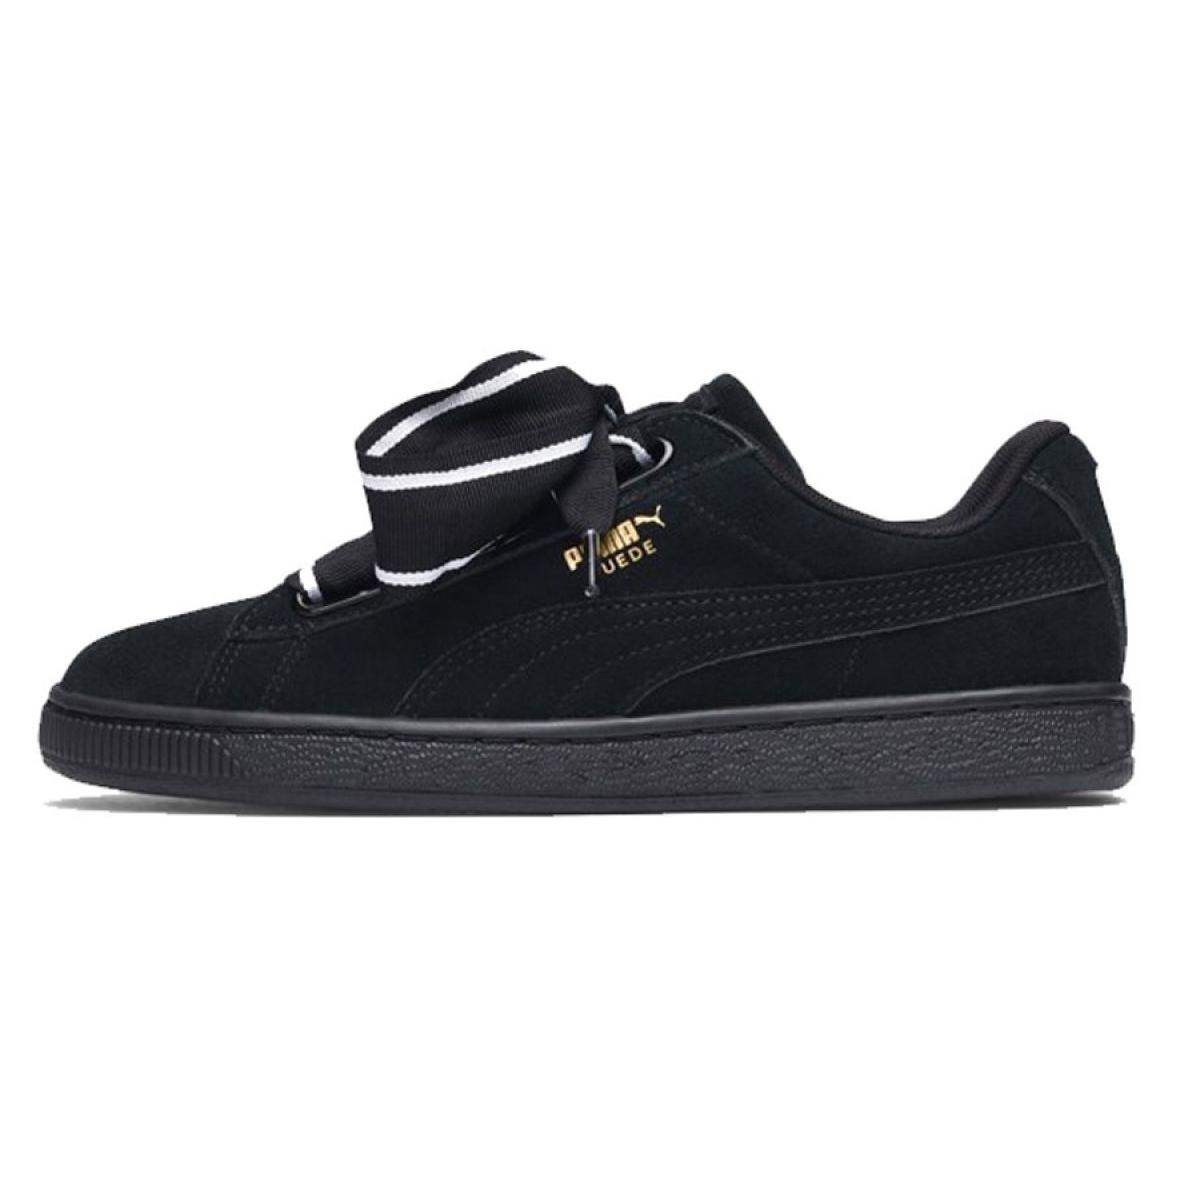 Heart Butymodne Suede Satin Ii Puma 01 Chaussures 364084 W Noir pl 3TKJ1cuF5l